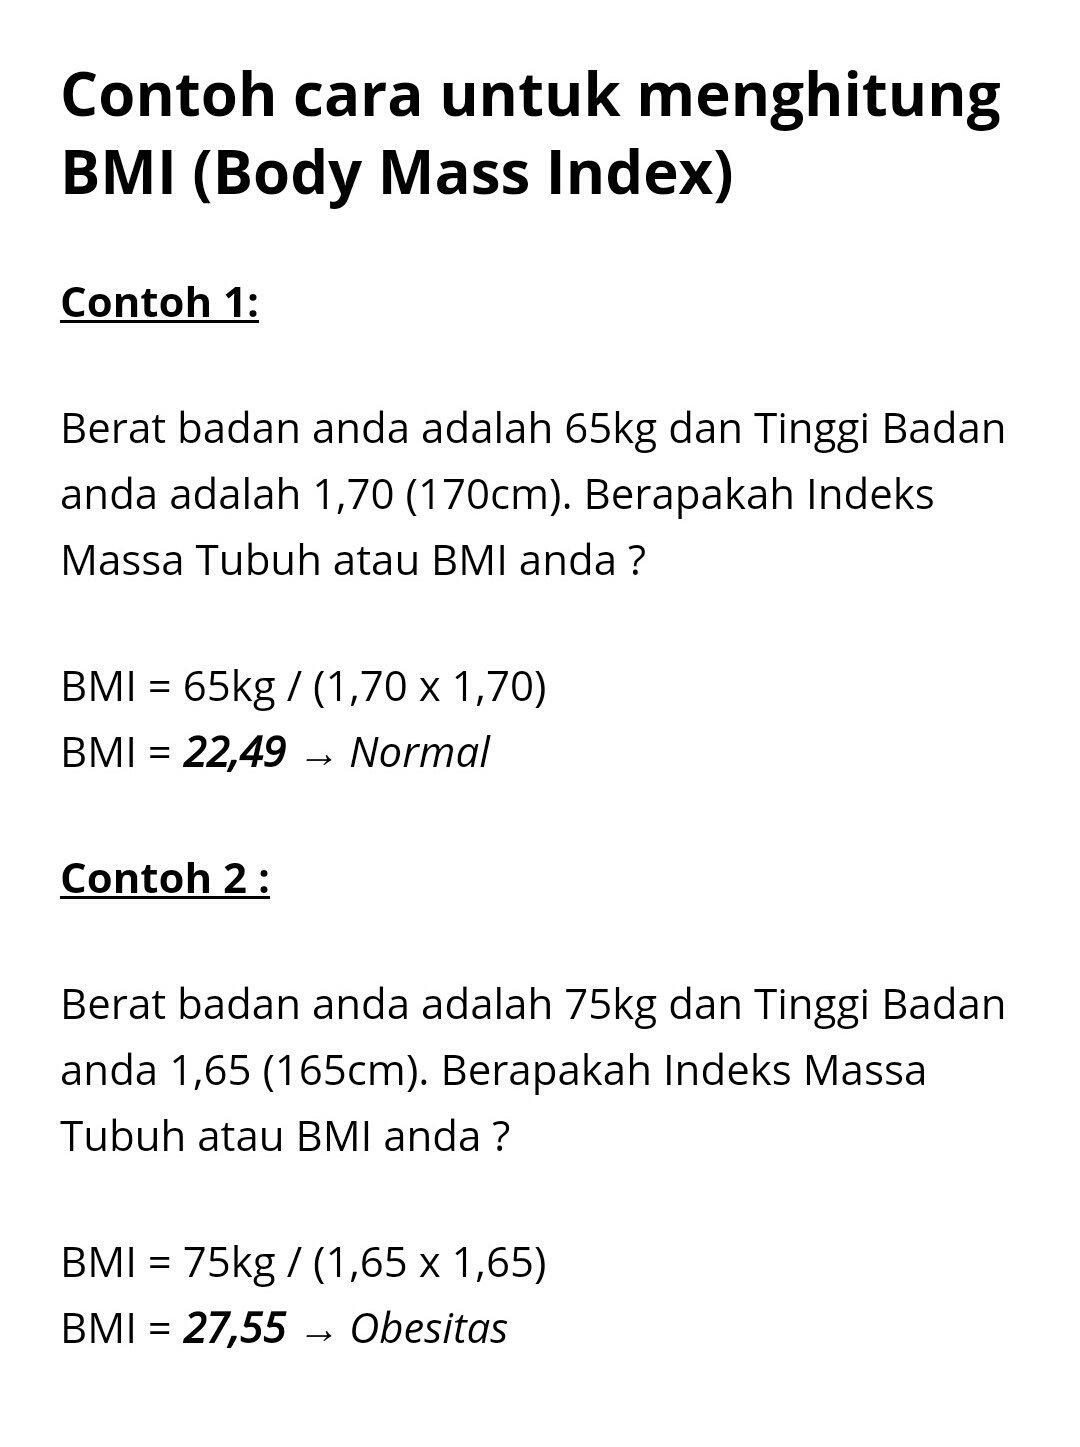 Tni Angkatan Udara On Twitter Mas Dhafinle Berikut Ini Cara Mengukur Berat Badan Ideal Body Mass Index Dmmp